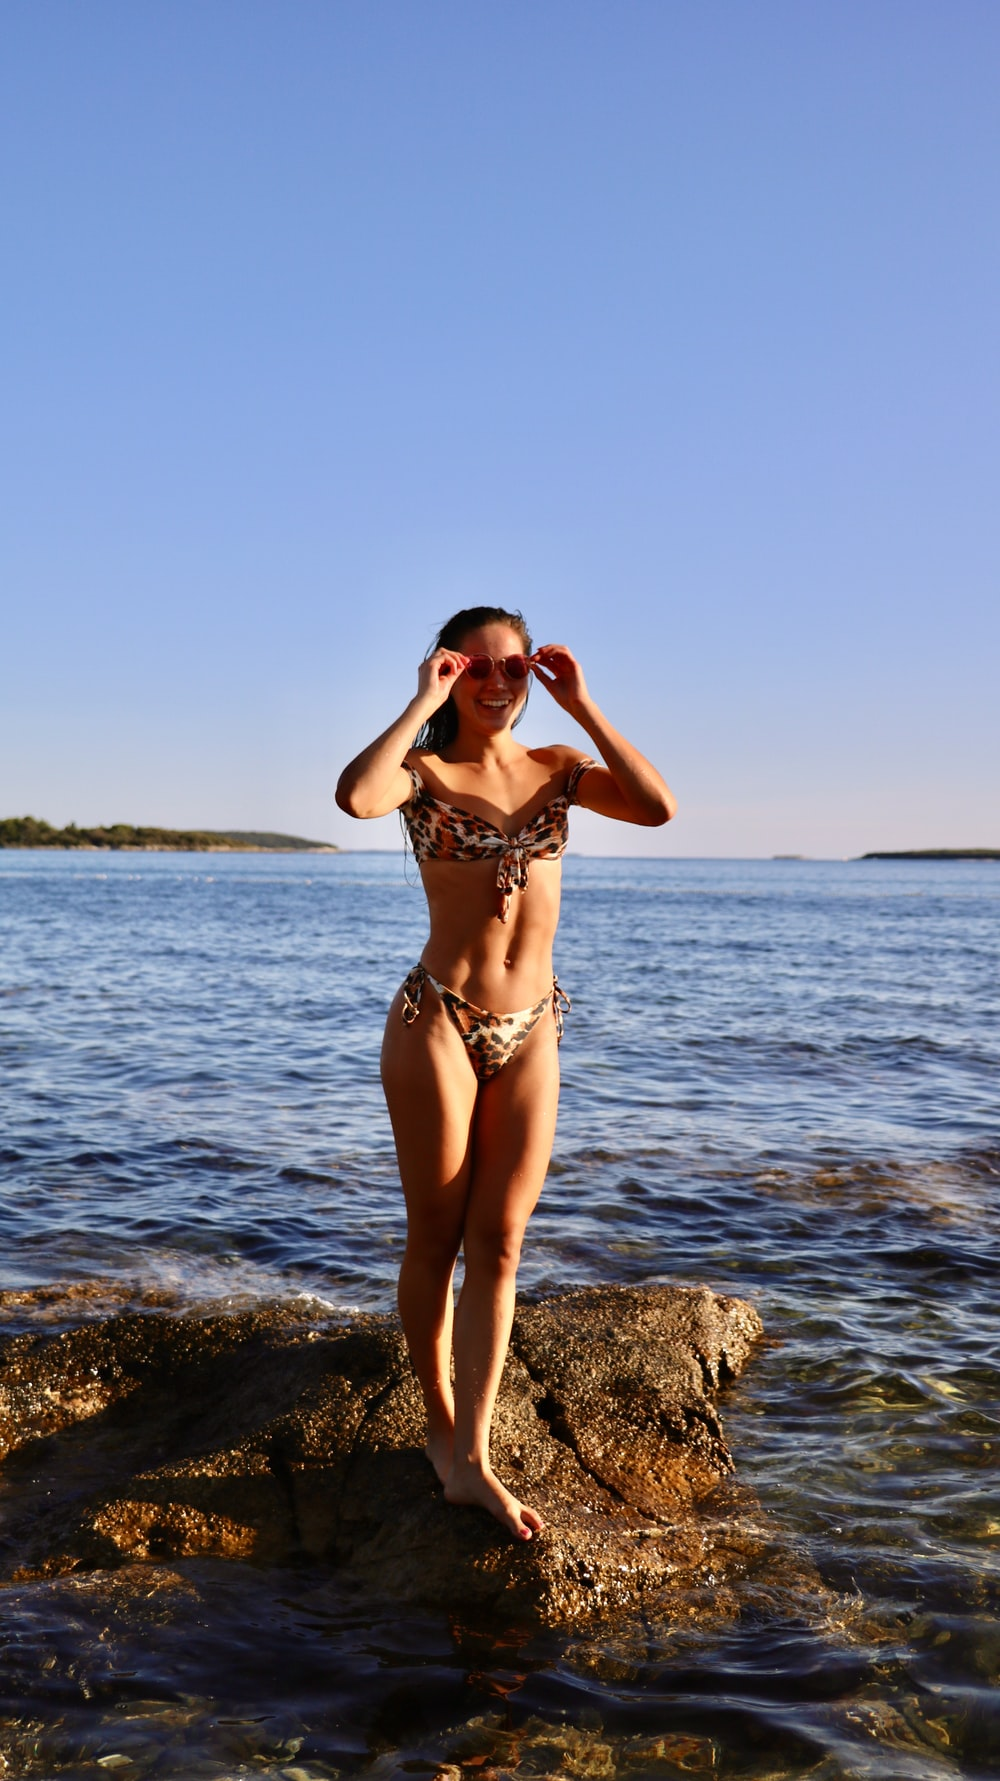 woman wearing bikini while standing on the stone near the body of water